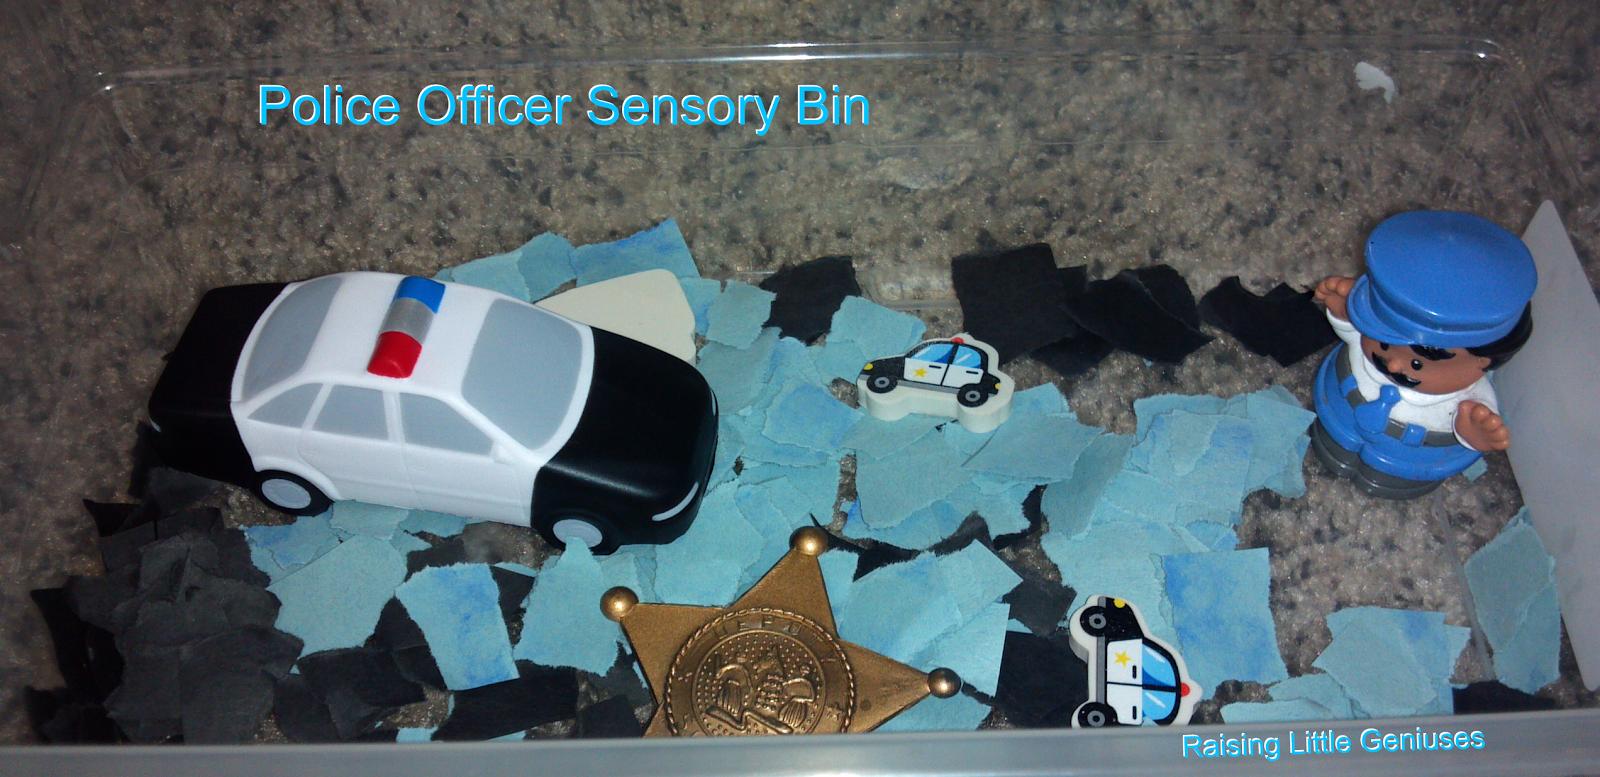 Policeman Sensory Bin Use This Sensory Bin As Part Of A